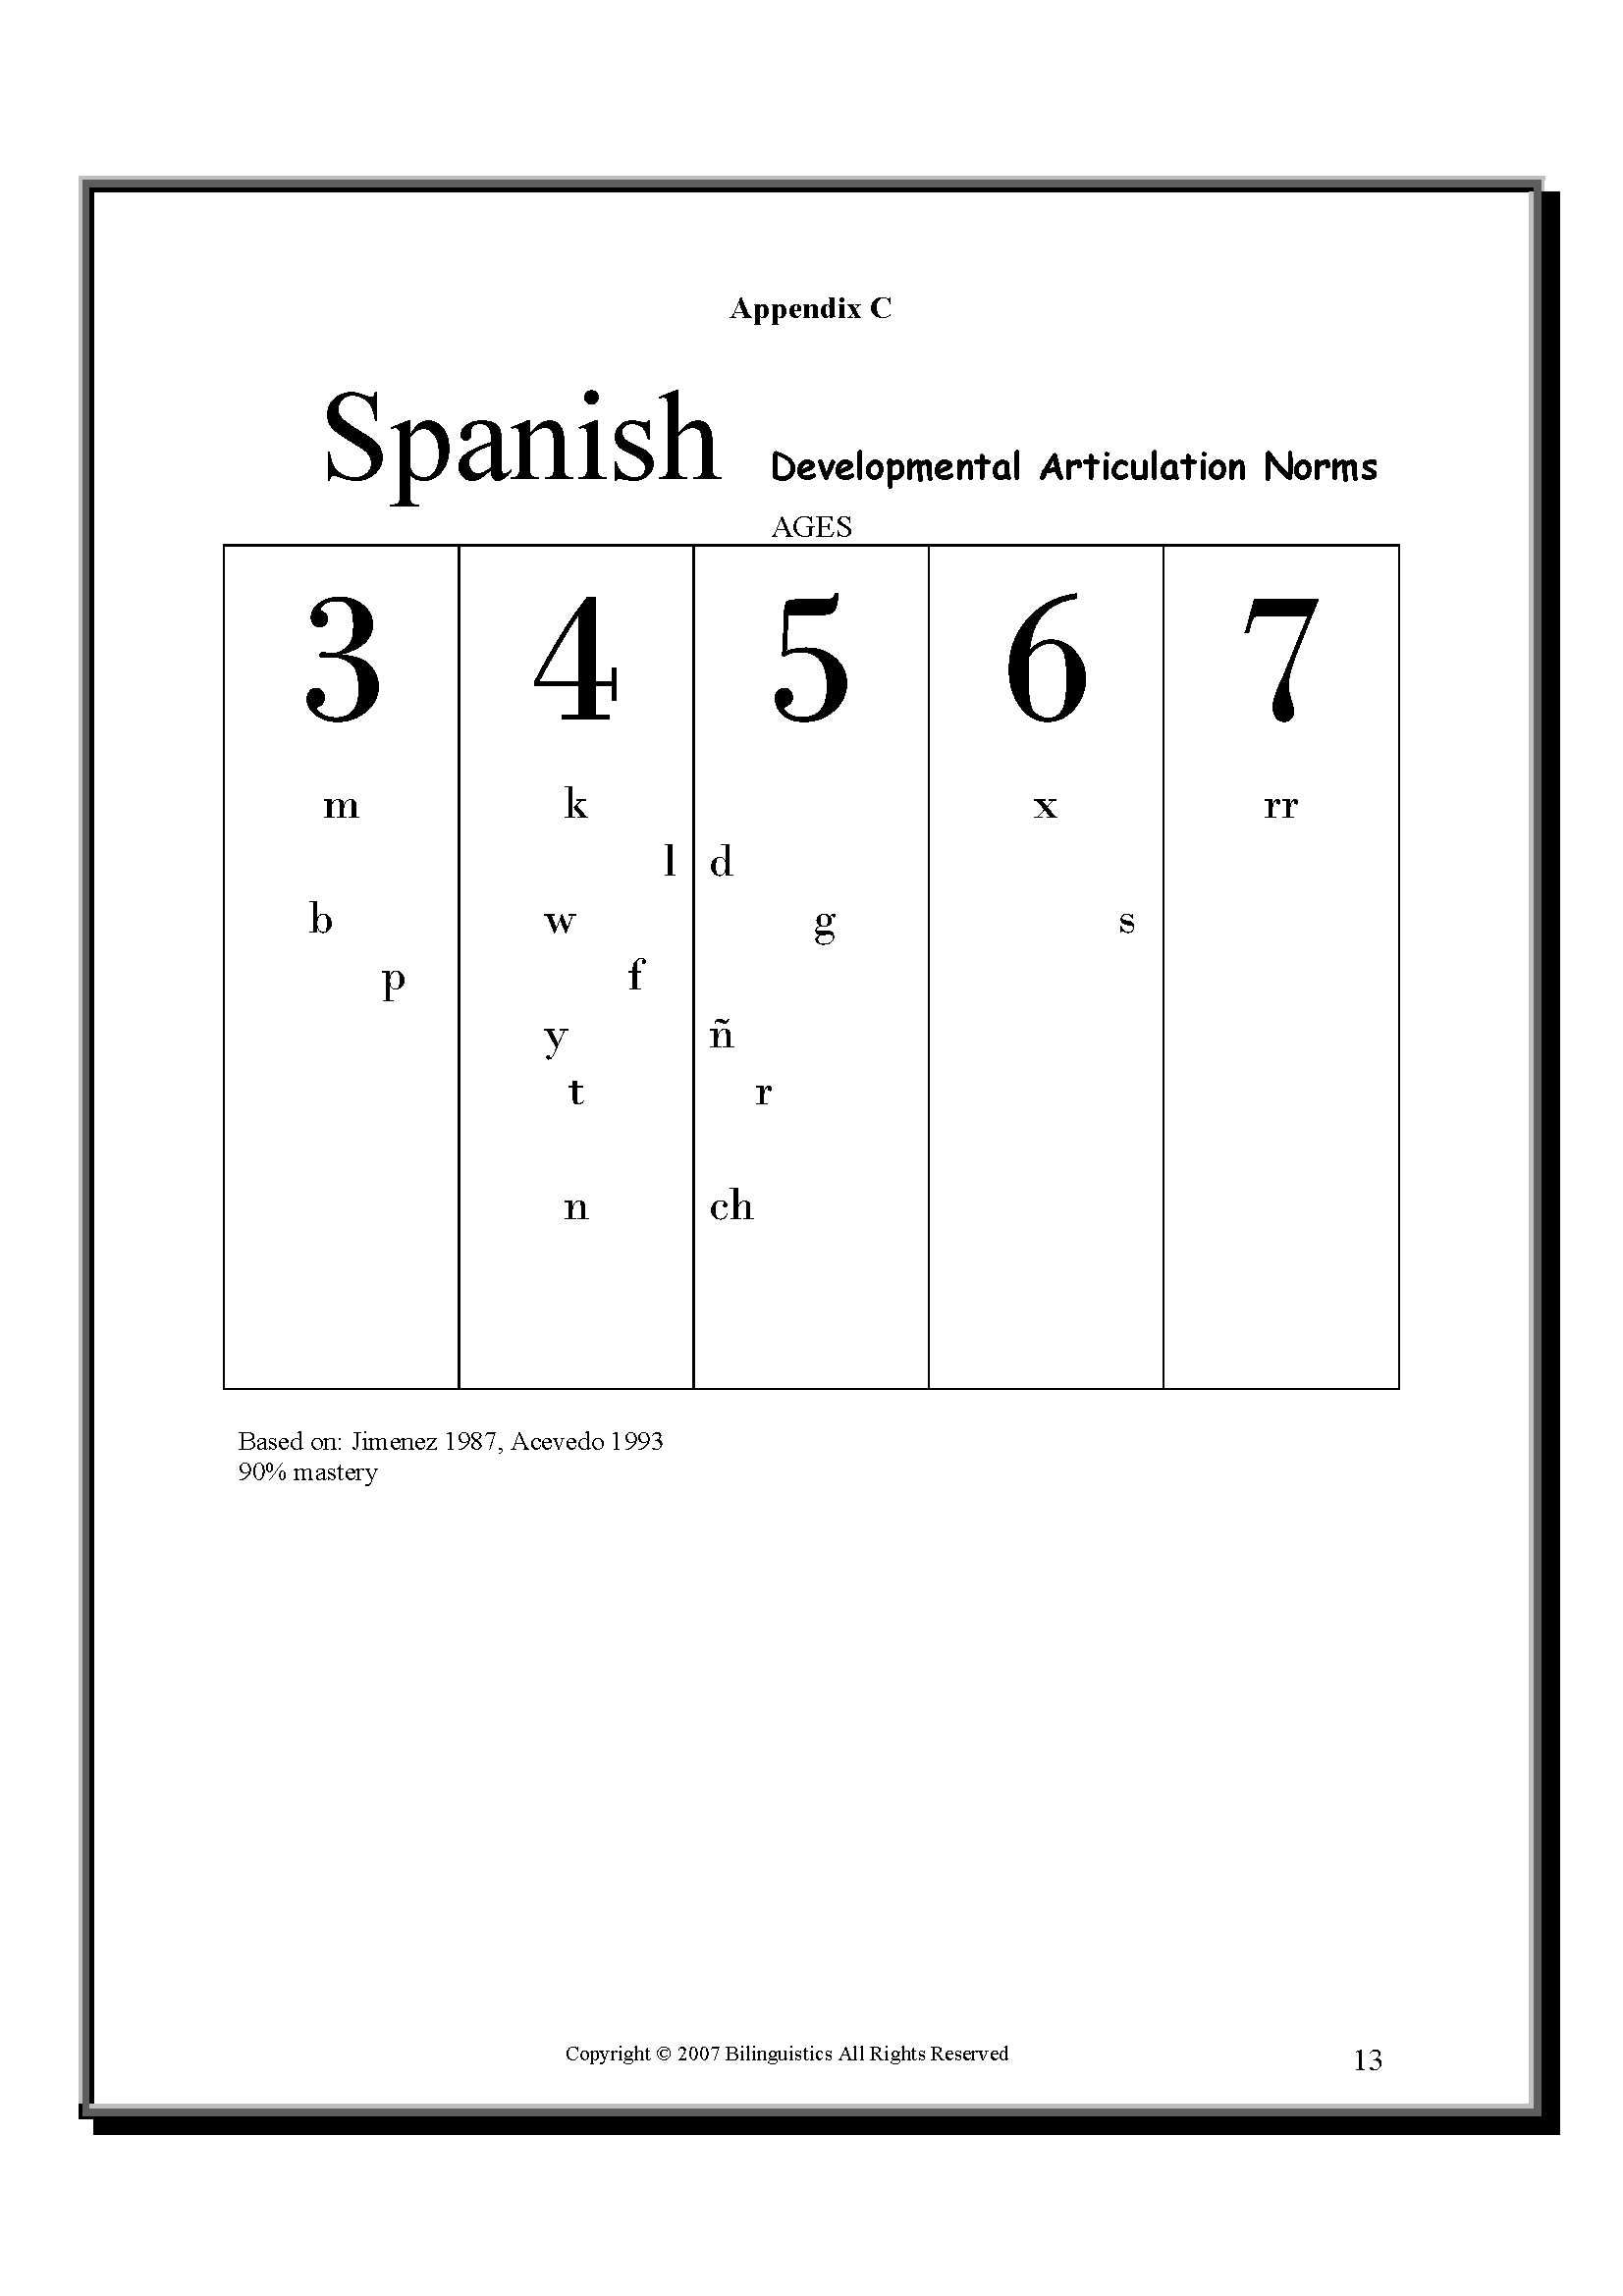 Spanish Development Articulation Norms